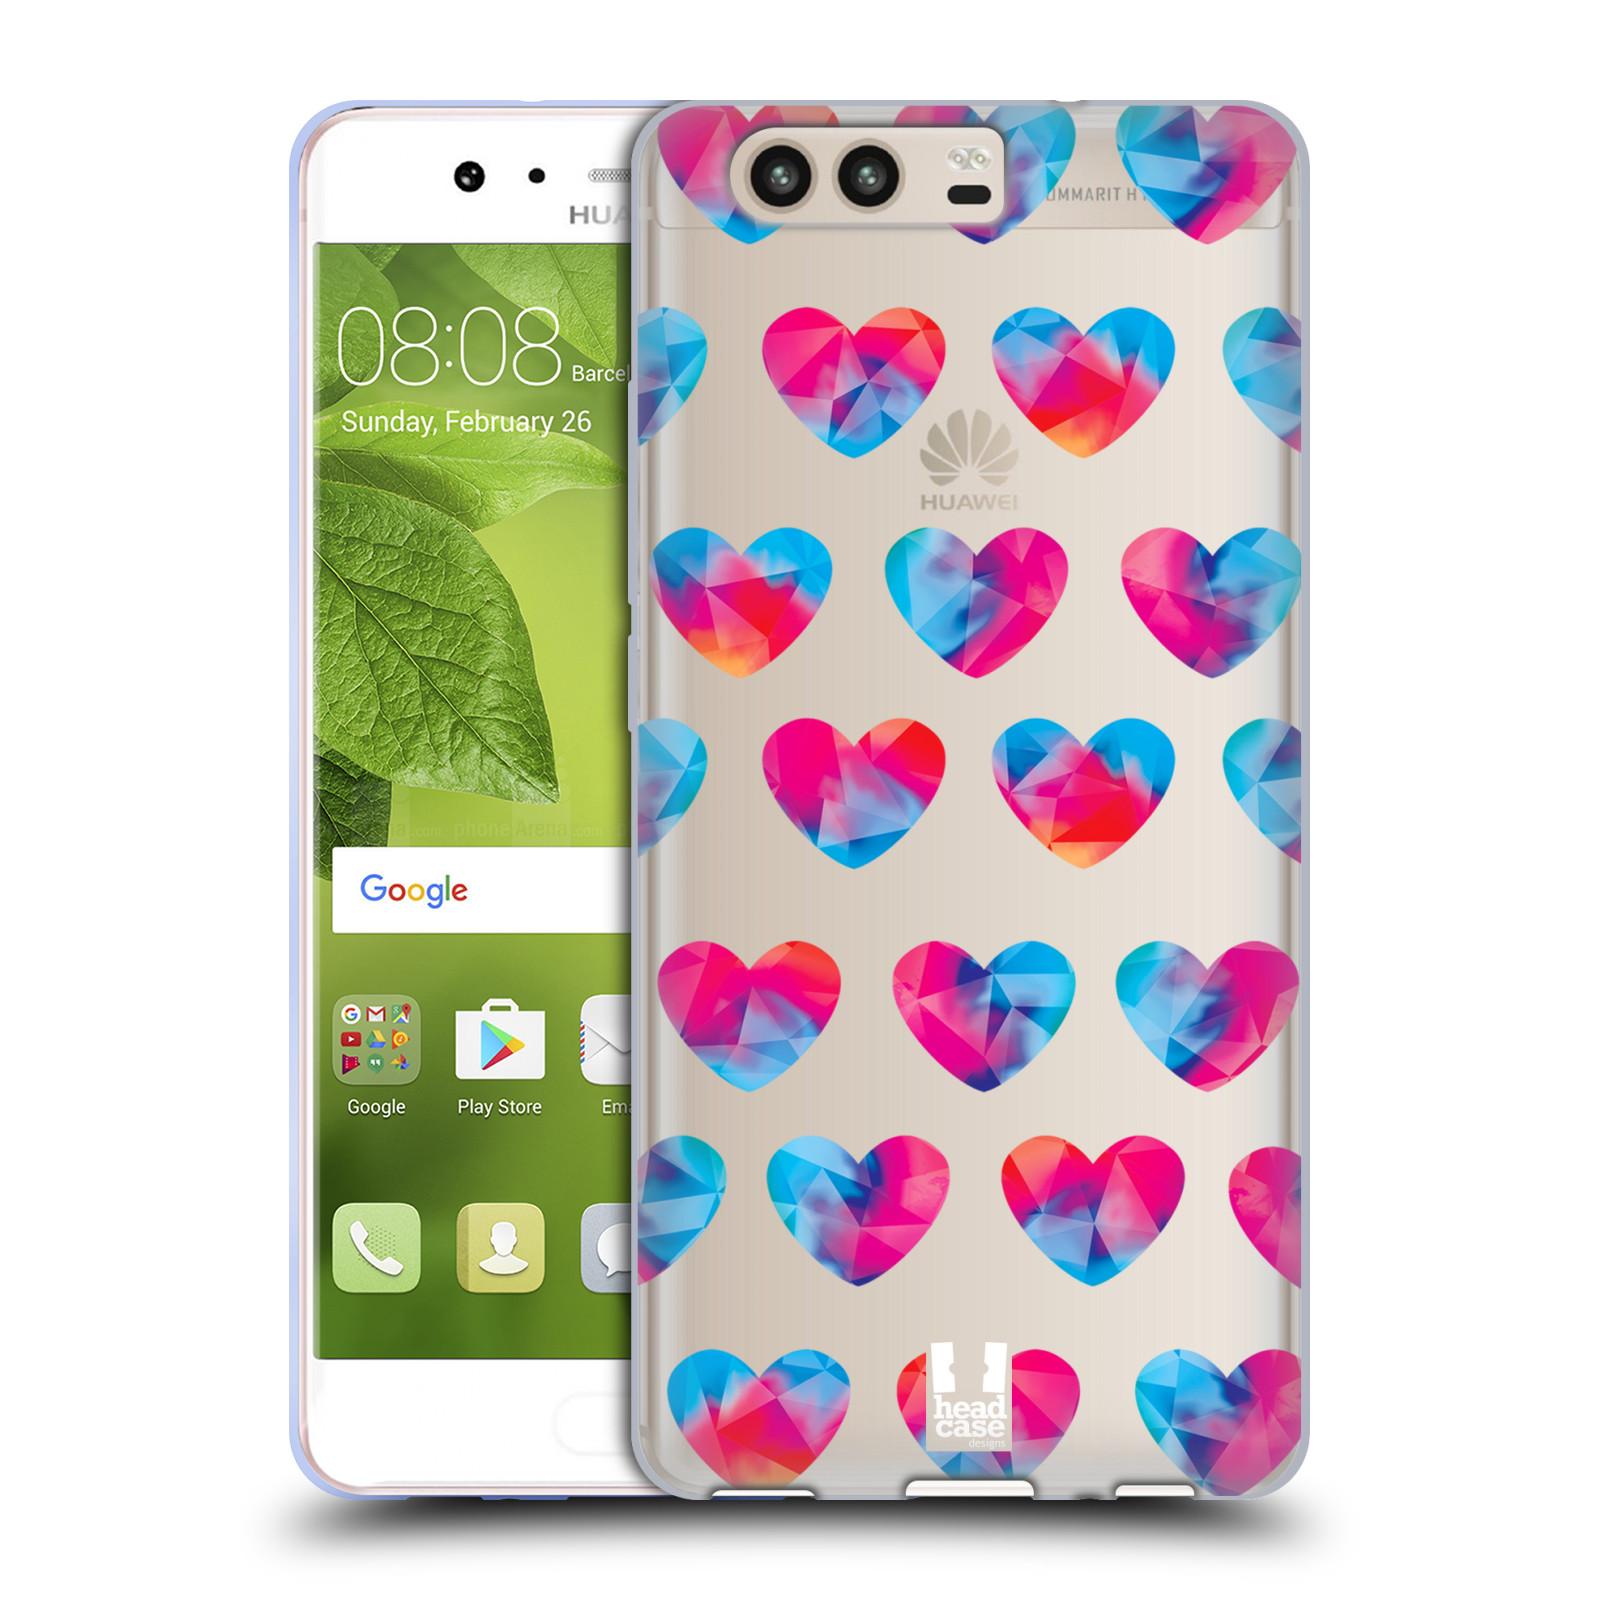 Silikonové pouzdro na mobil Huawei P10 - Head Case - Srdíčka hrající barvami